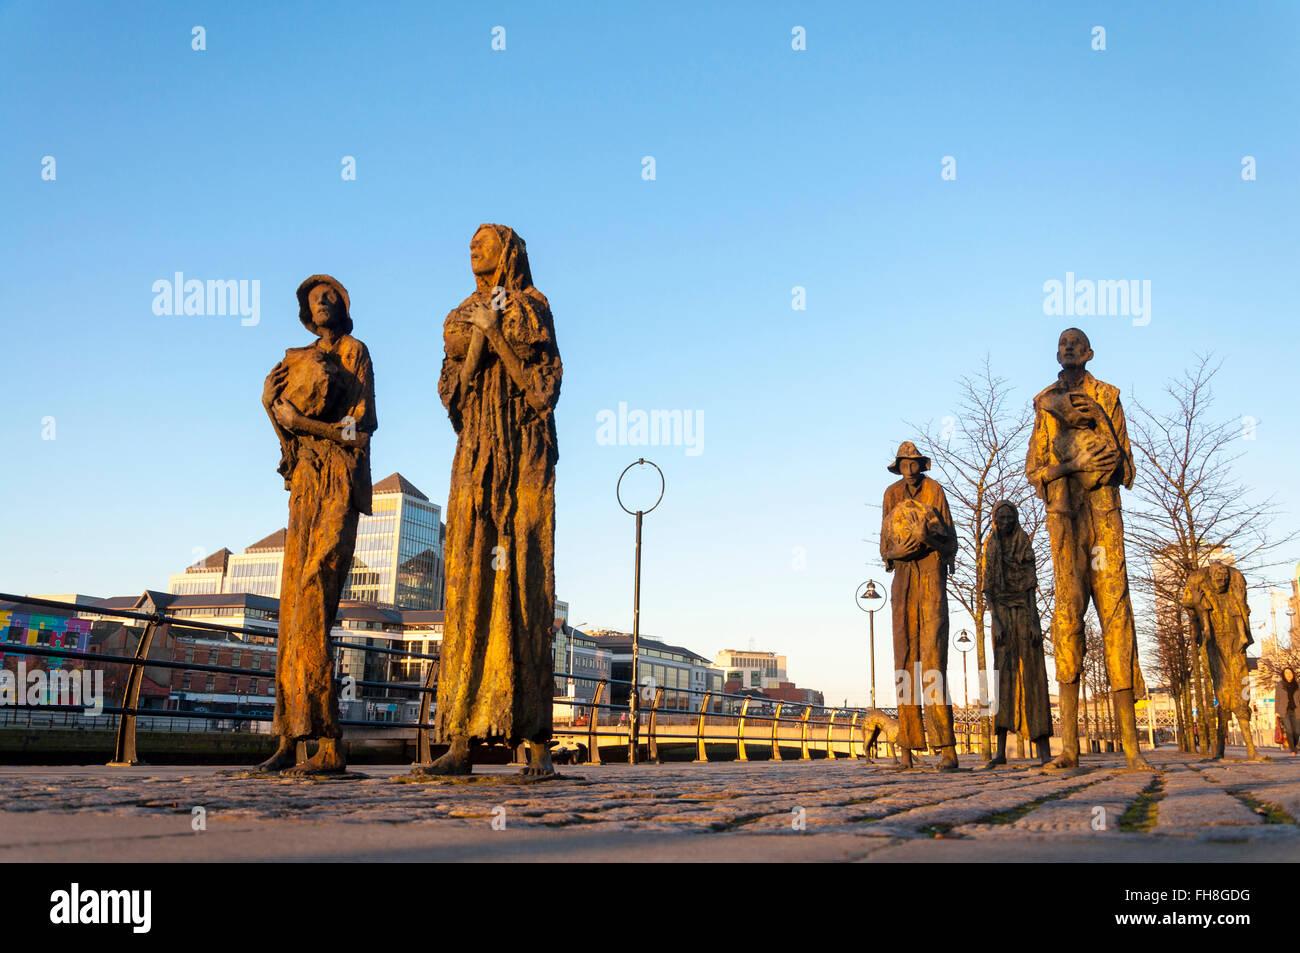 The Famine Memorial, Dublin, Ireland - Stock Image